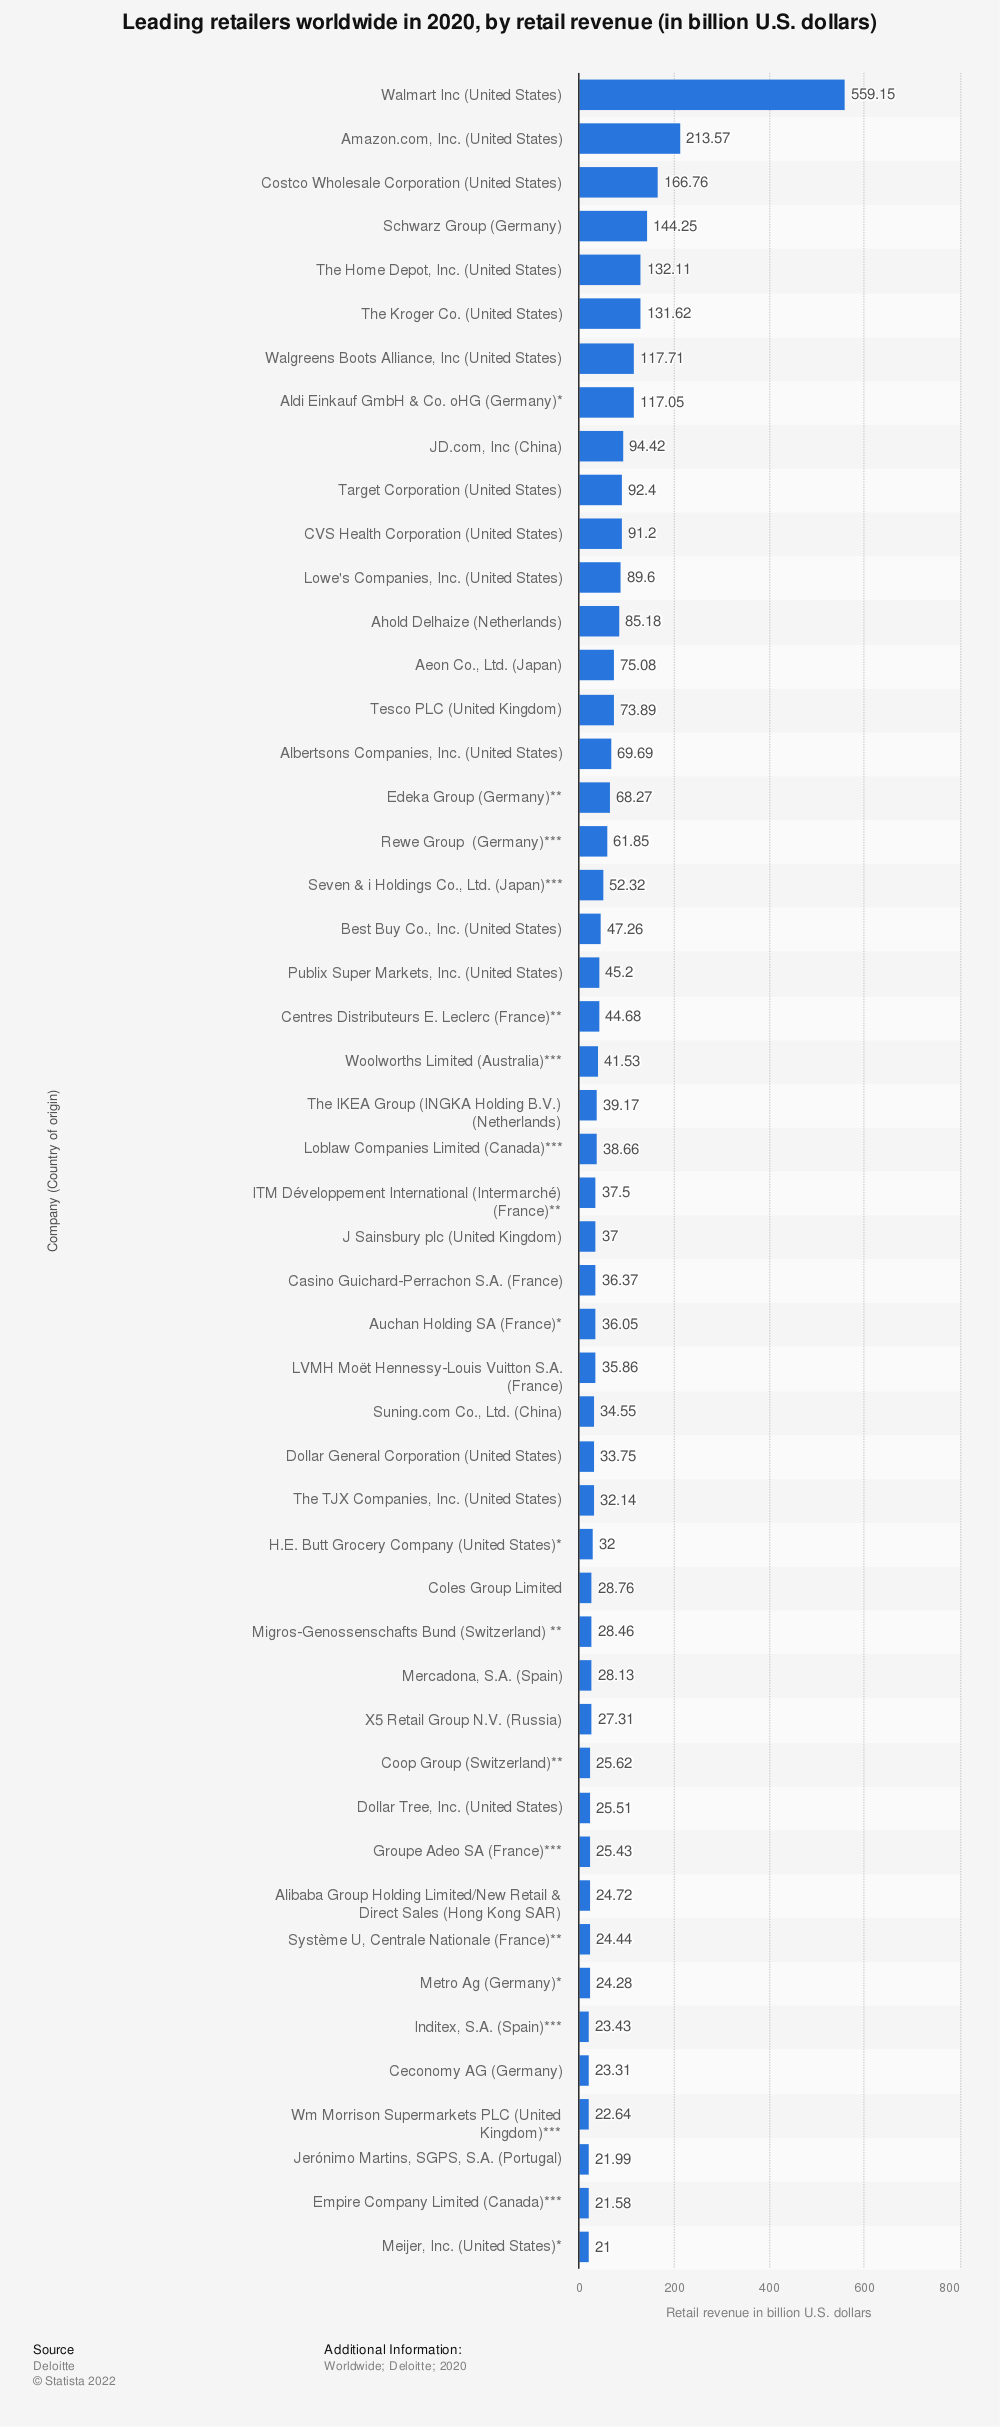 Statistic: Leading retailers worldwide in 2019, by retail revenue (in billion U.S. dollars) | Statista